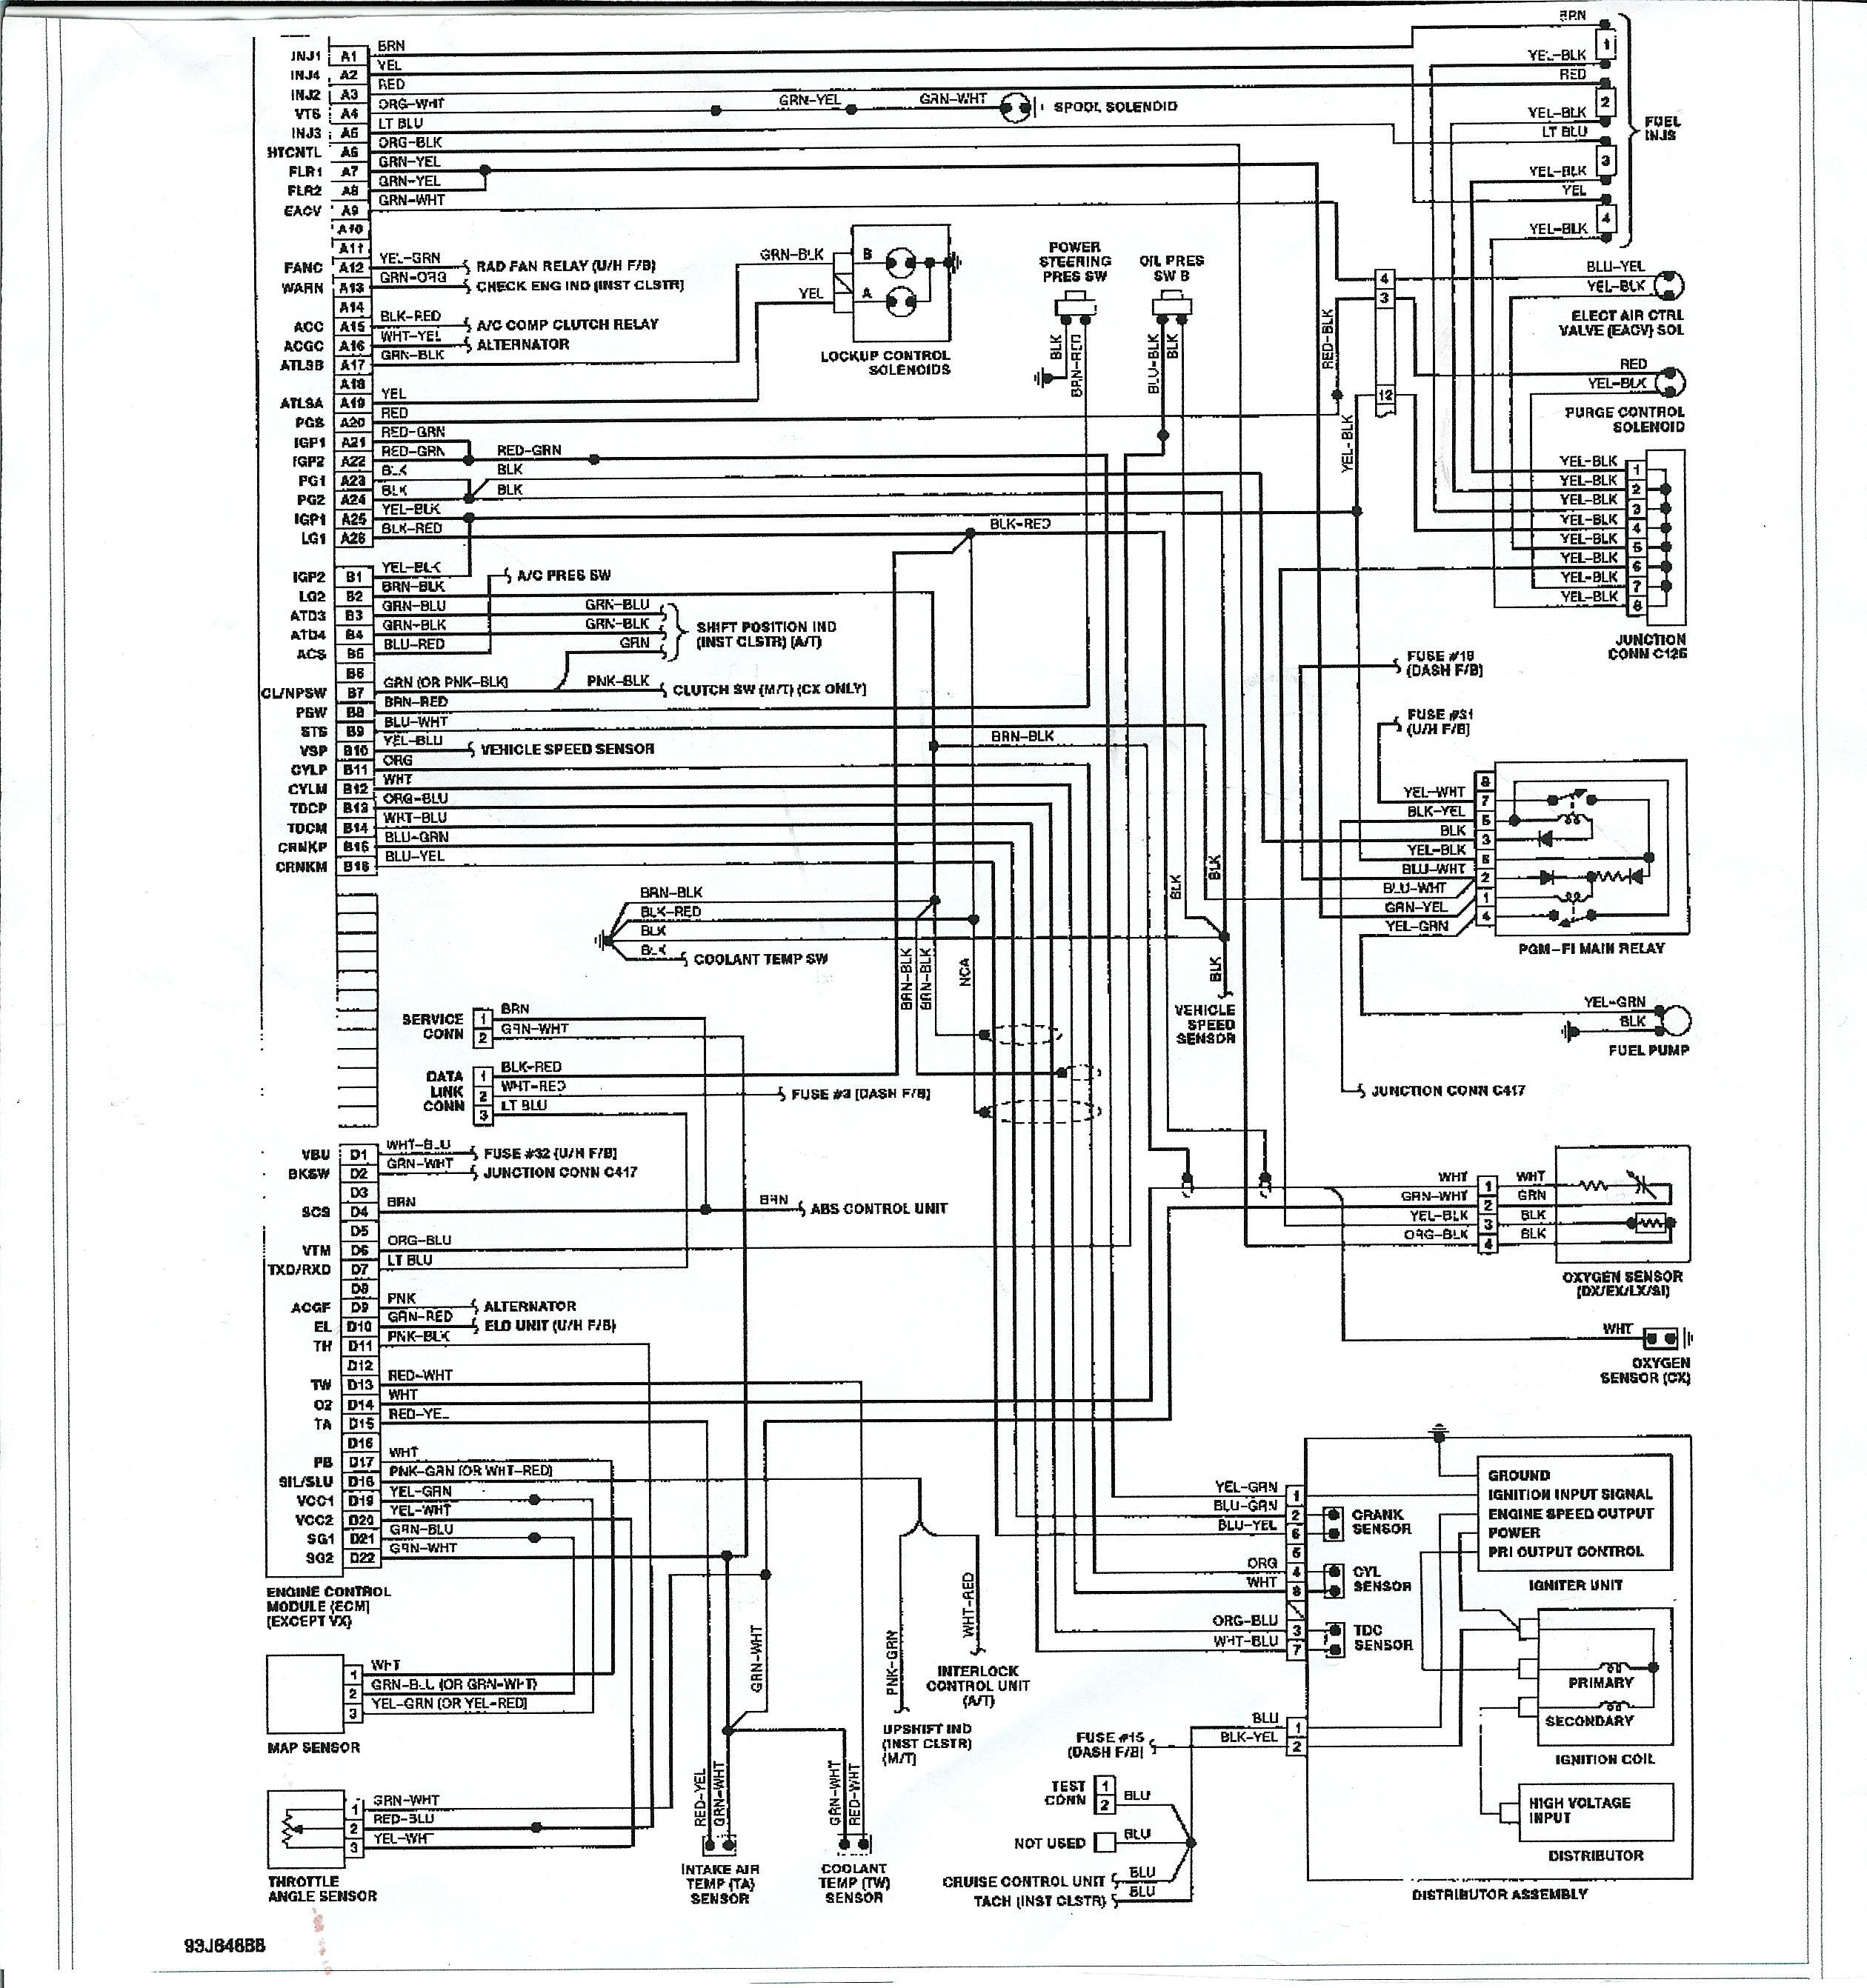 Honda Civik Ek Engine Wiring Diagram Honda Accord Transmission Wiring Diagram Chrysler Of Honda Civik Ek Engine Wiring Diagram